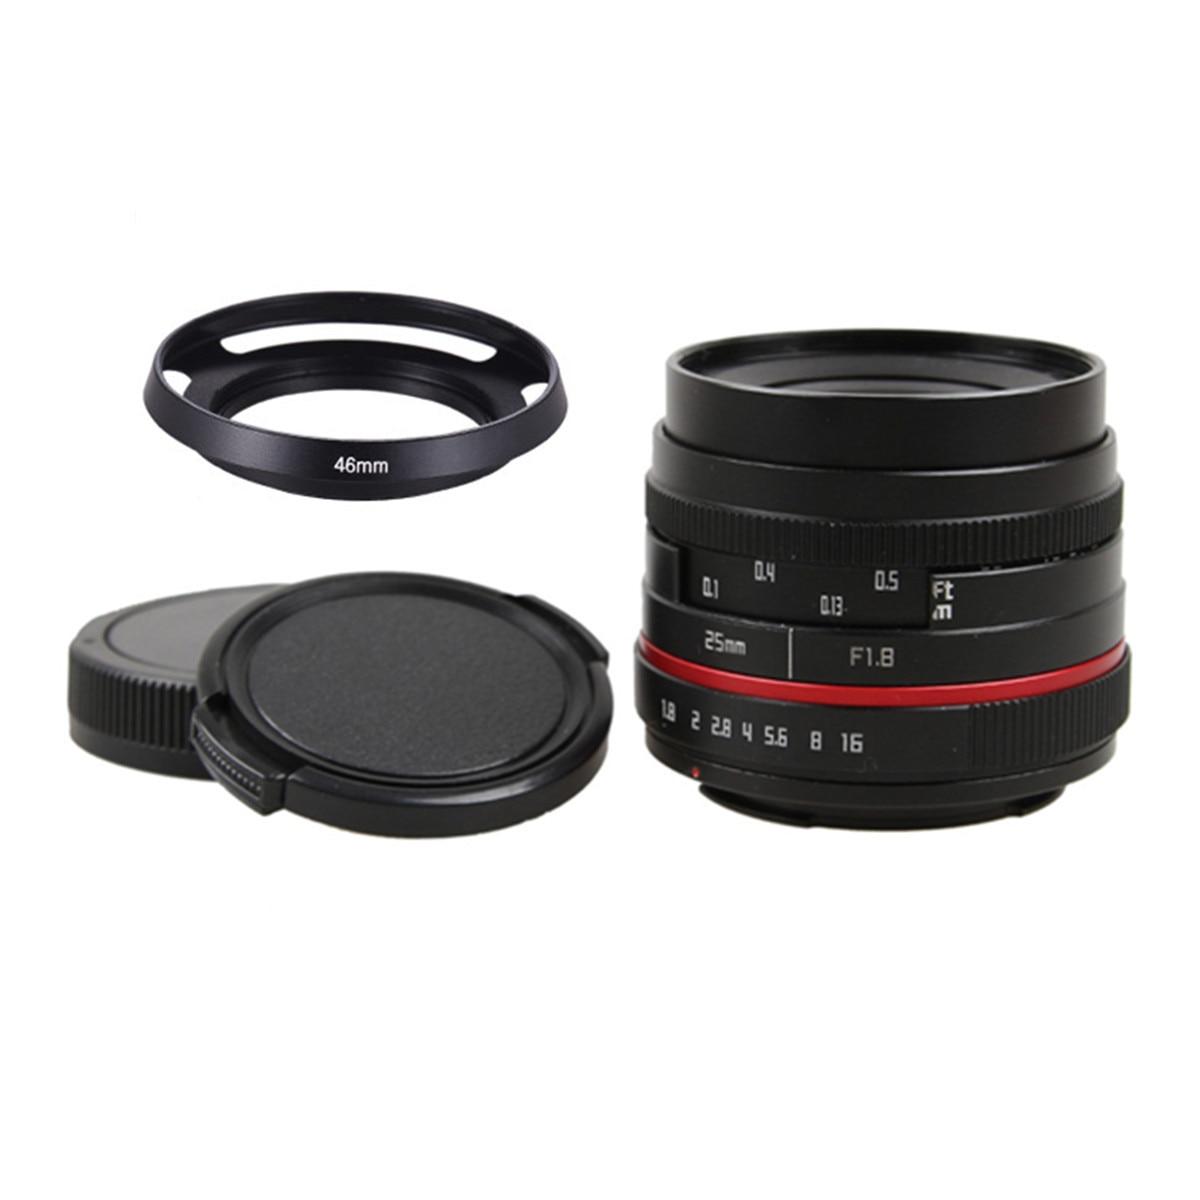 25mm F1.8 Manual Wide Angle Lens+metal Lens Hood for Olympus Panasonic Micro 4/3 M4/3 GX7 GX8 OM-D E-M5/II E-M1/II E-M10II/III